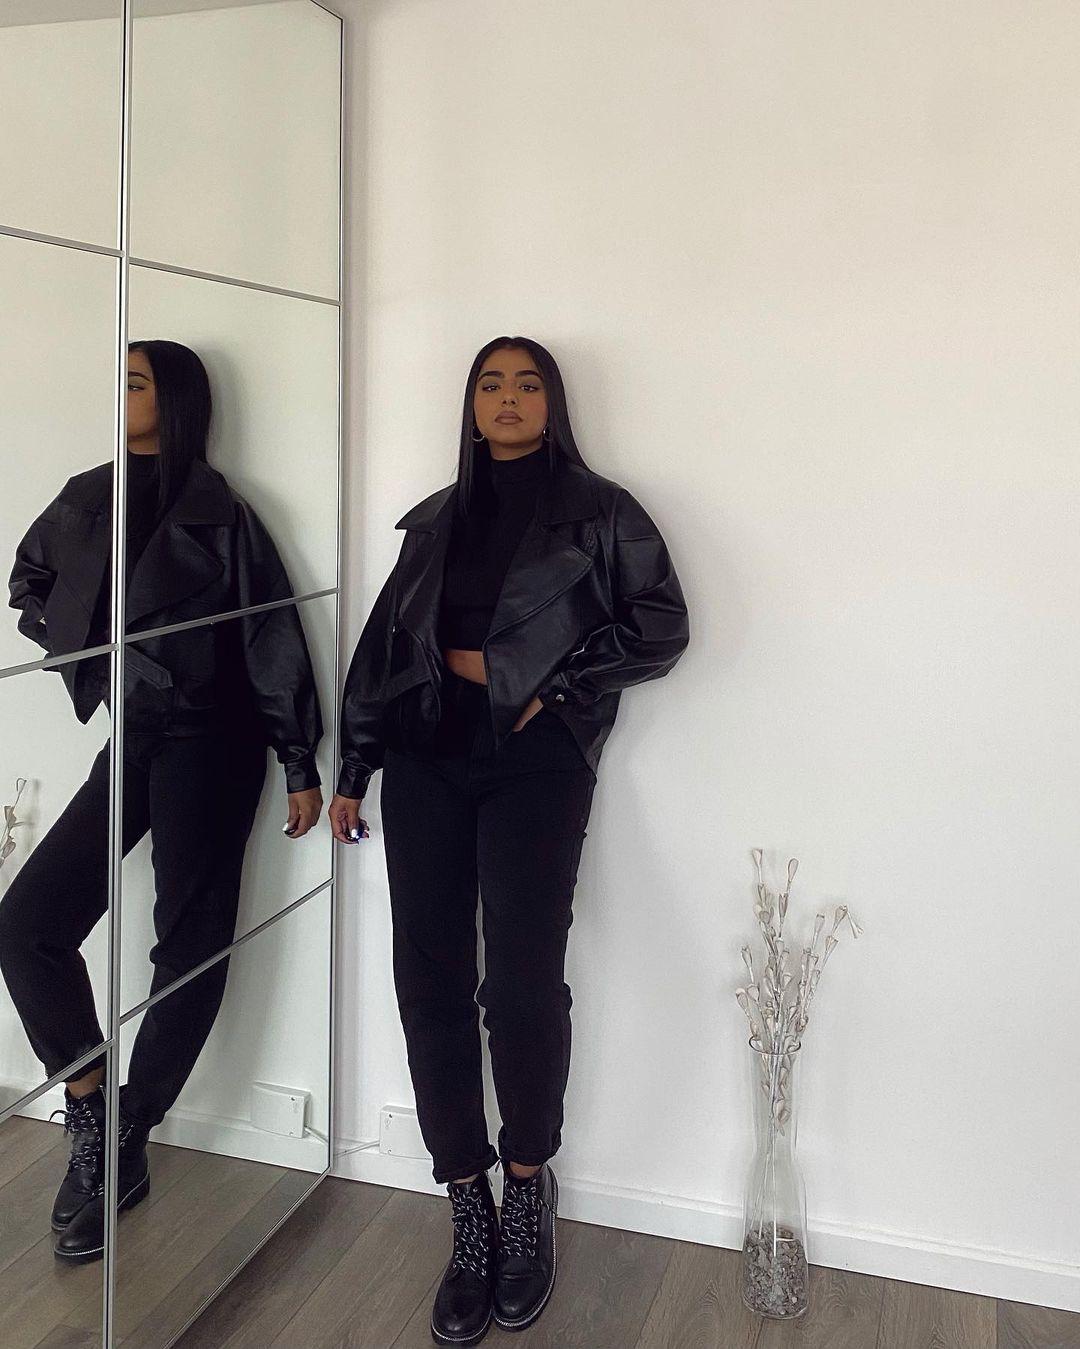 Soniaa-jay-Wallpapers-Insta-Fit-Bio-9